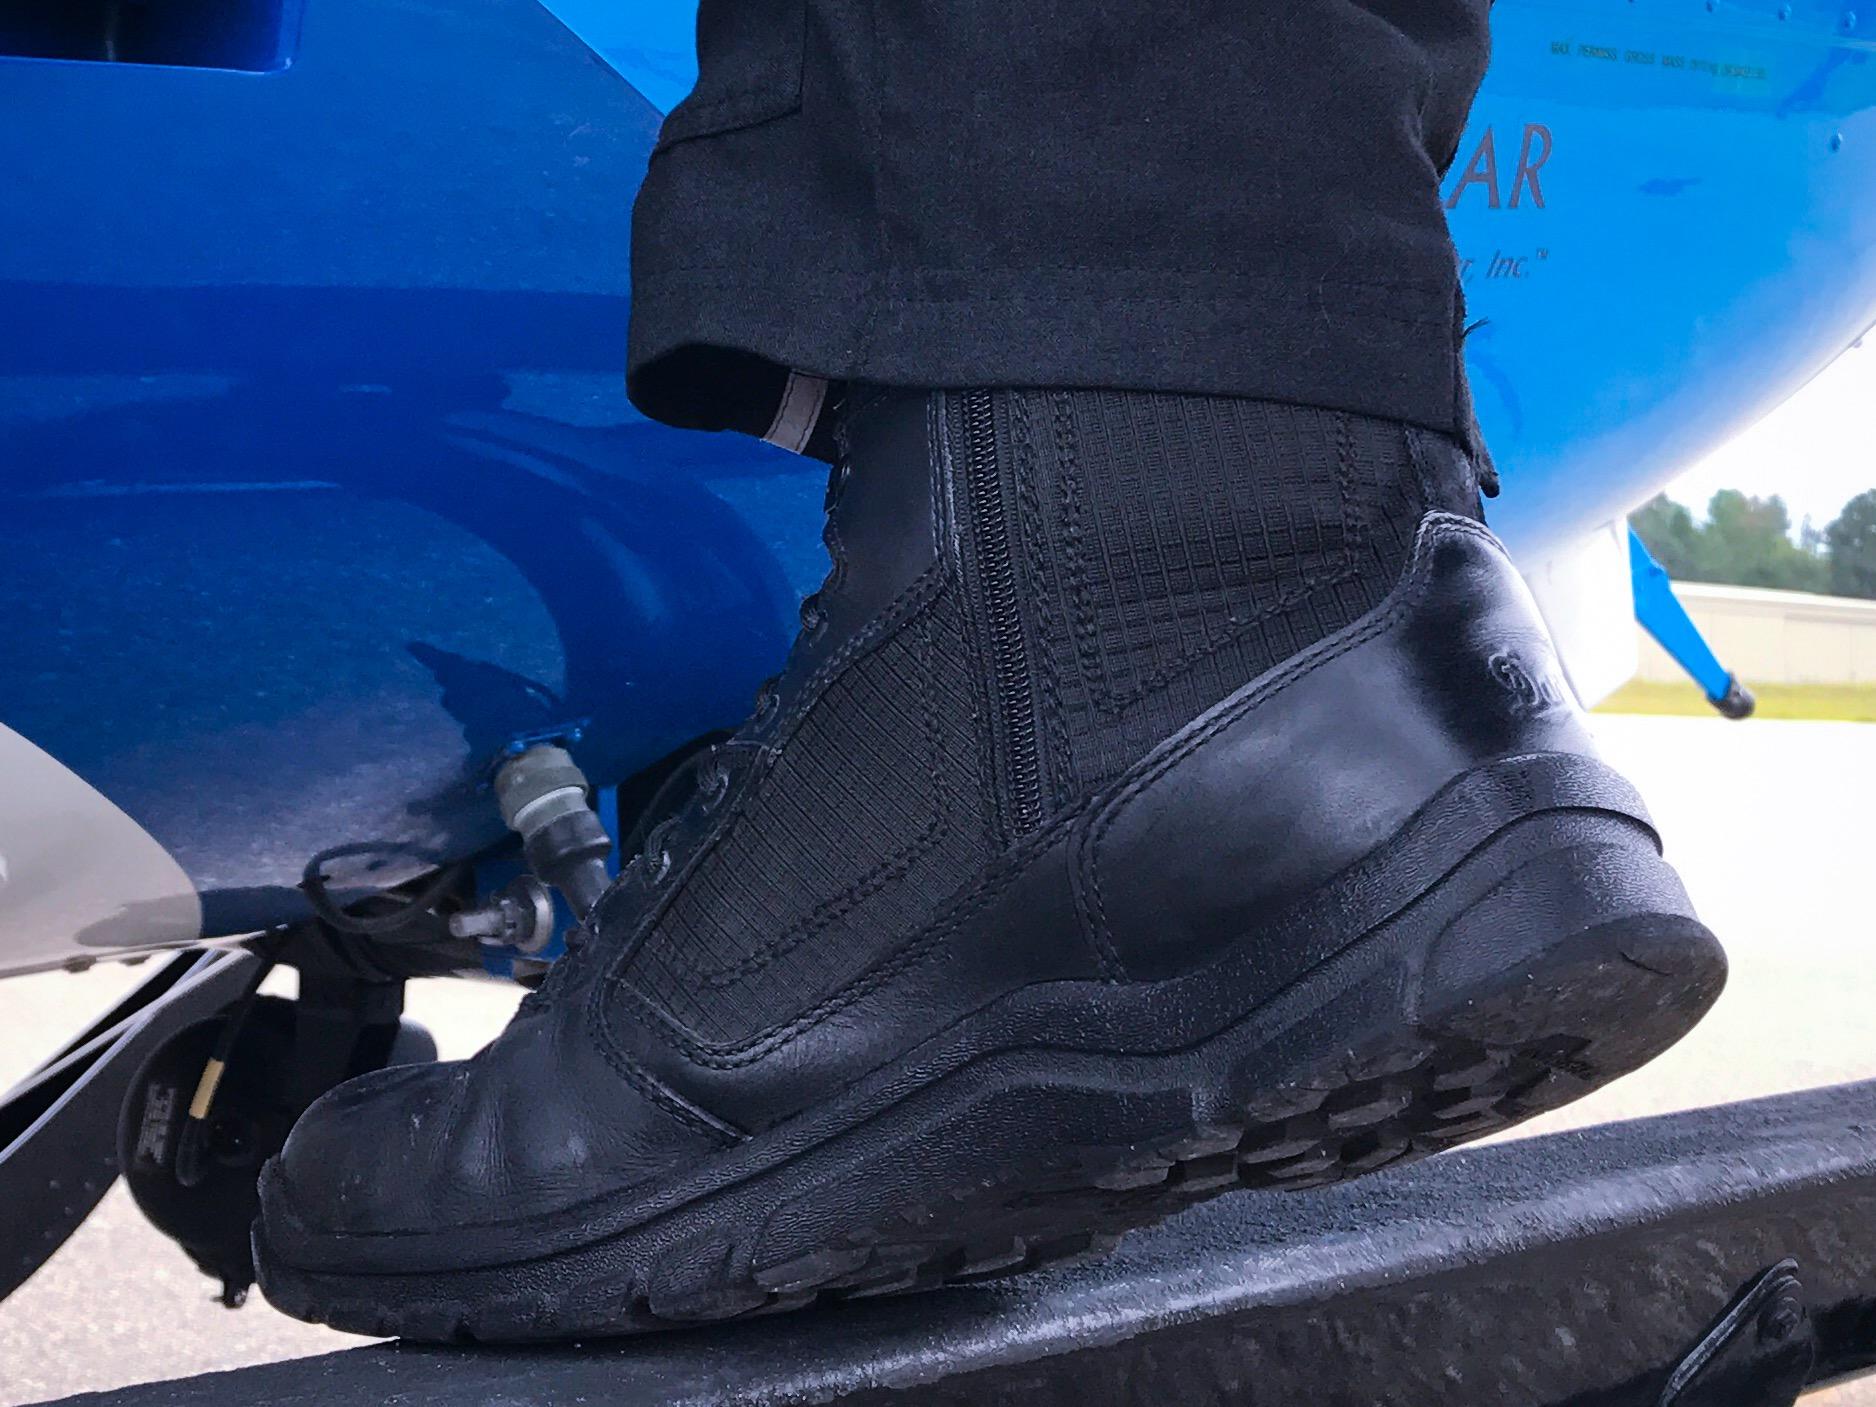 Danner Flight Boots